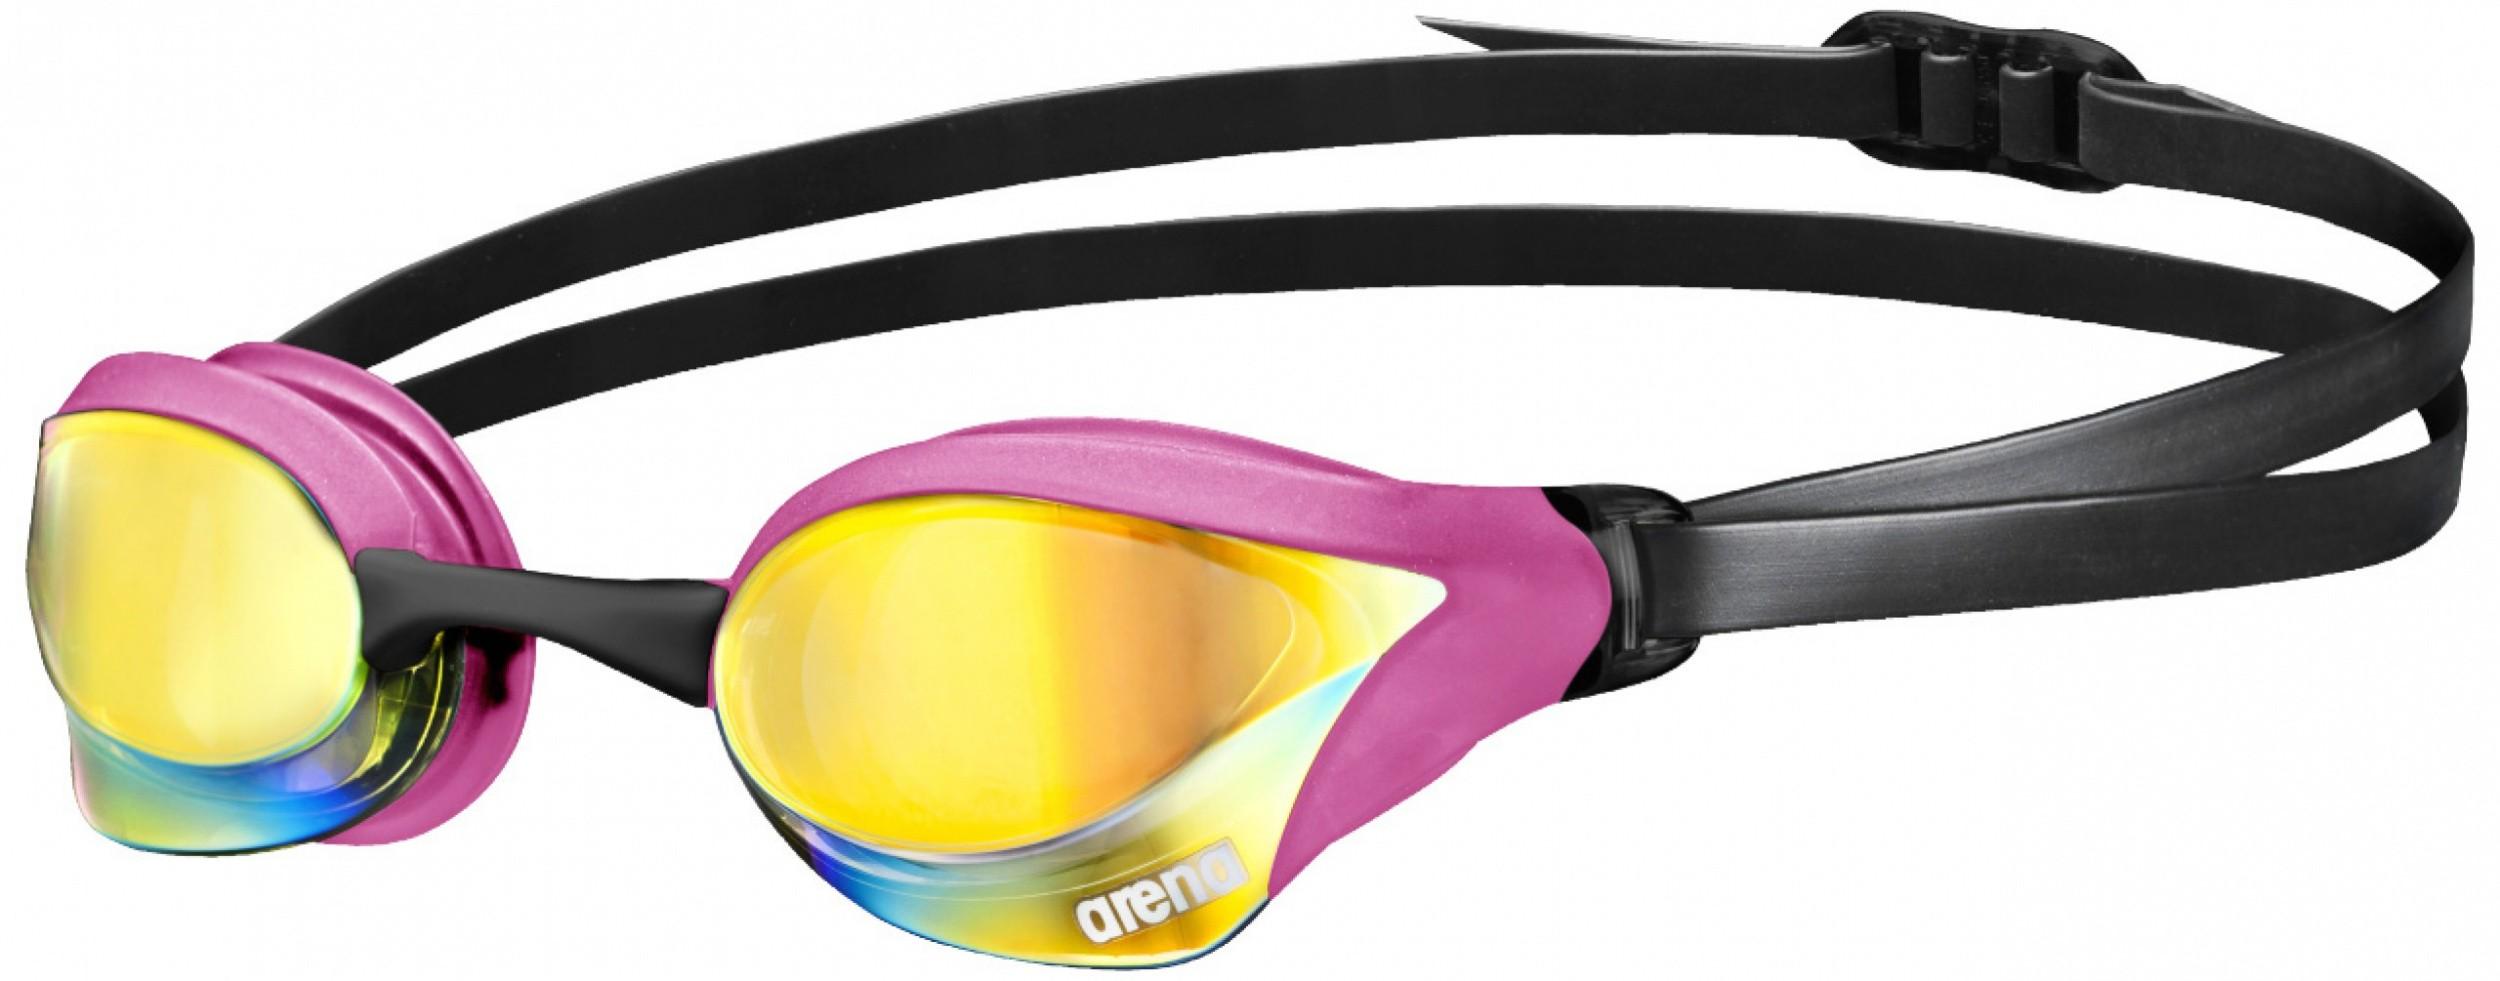 Cobra Core Mirror revo-pink-black